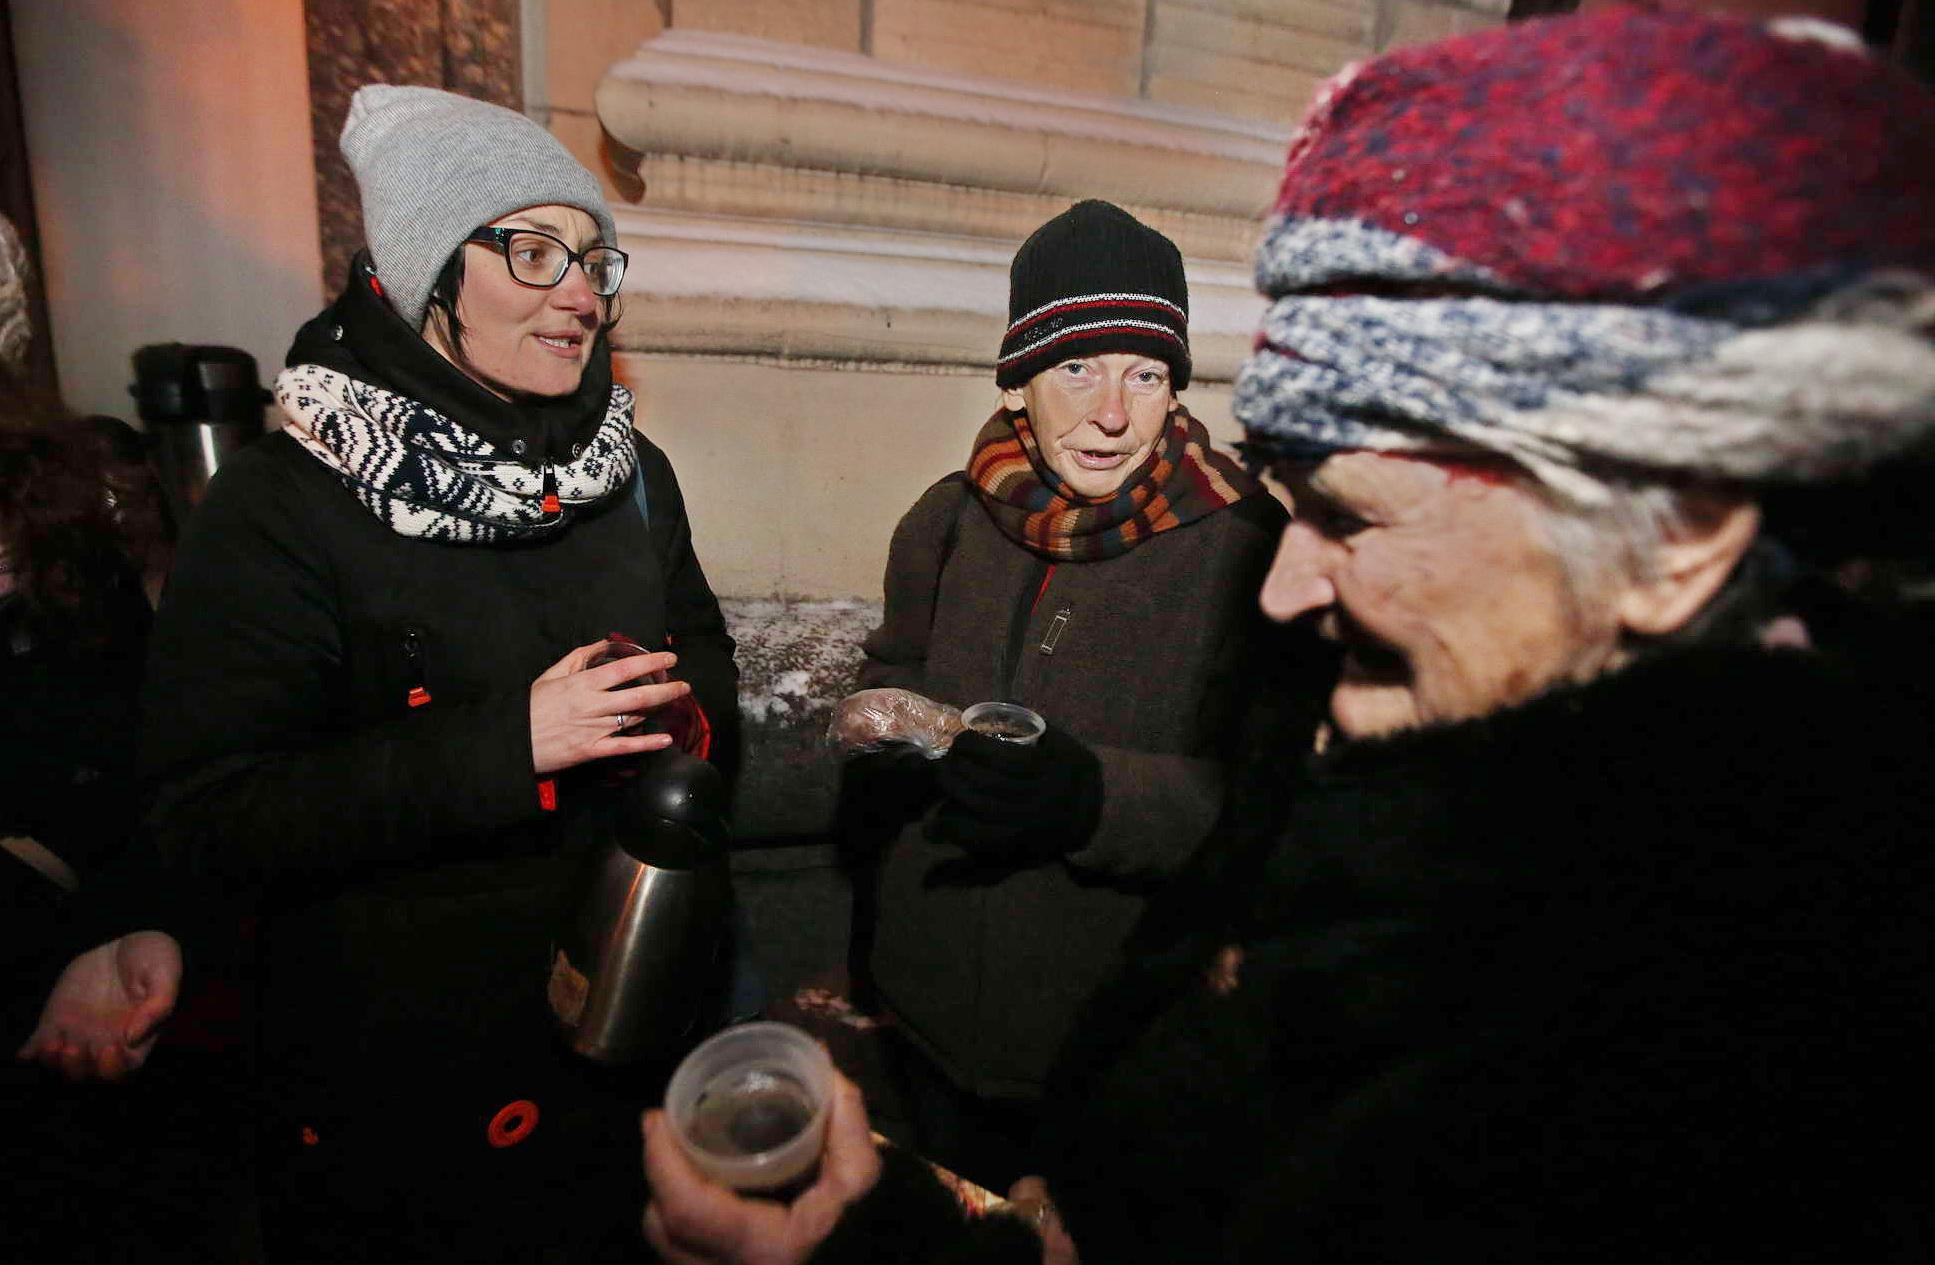 Kyiv volunteers help homeless, Roma people | KyivPost